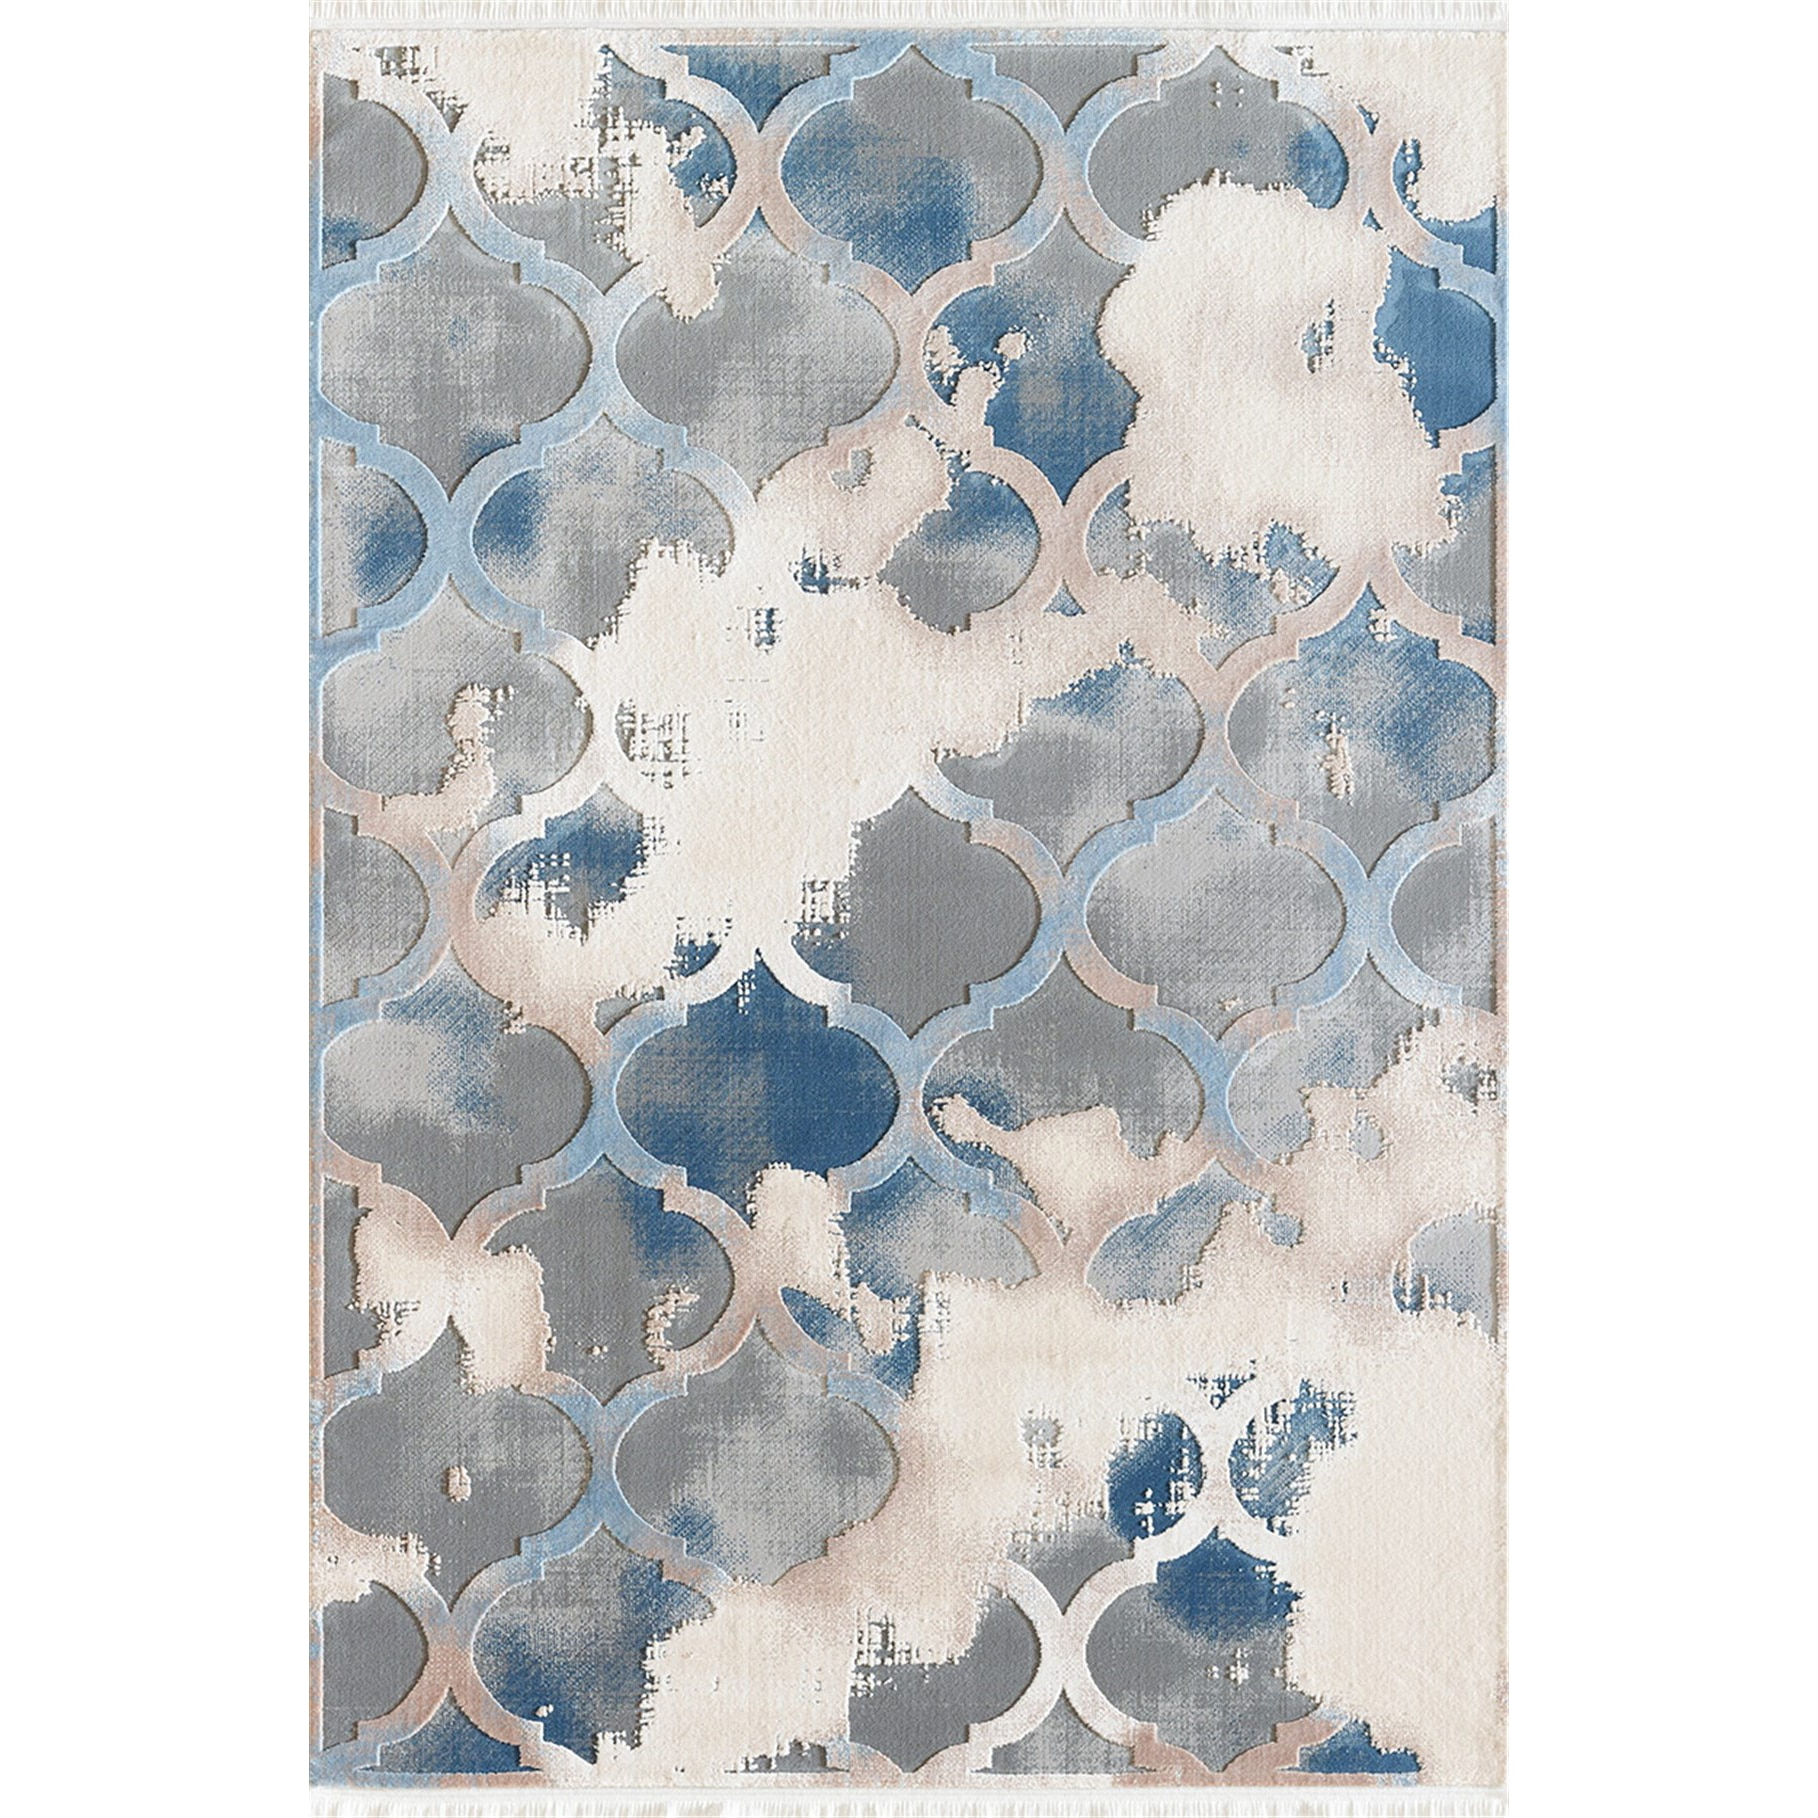 Fotografie Covor Girit Pierre Cardin, antistatic, acrilic, 120x180cm, albastru/crem, GR03C